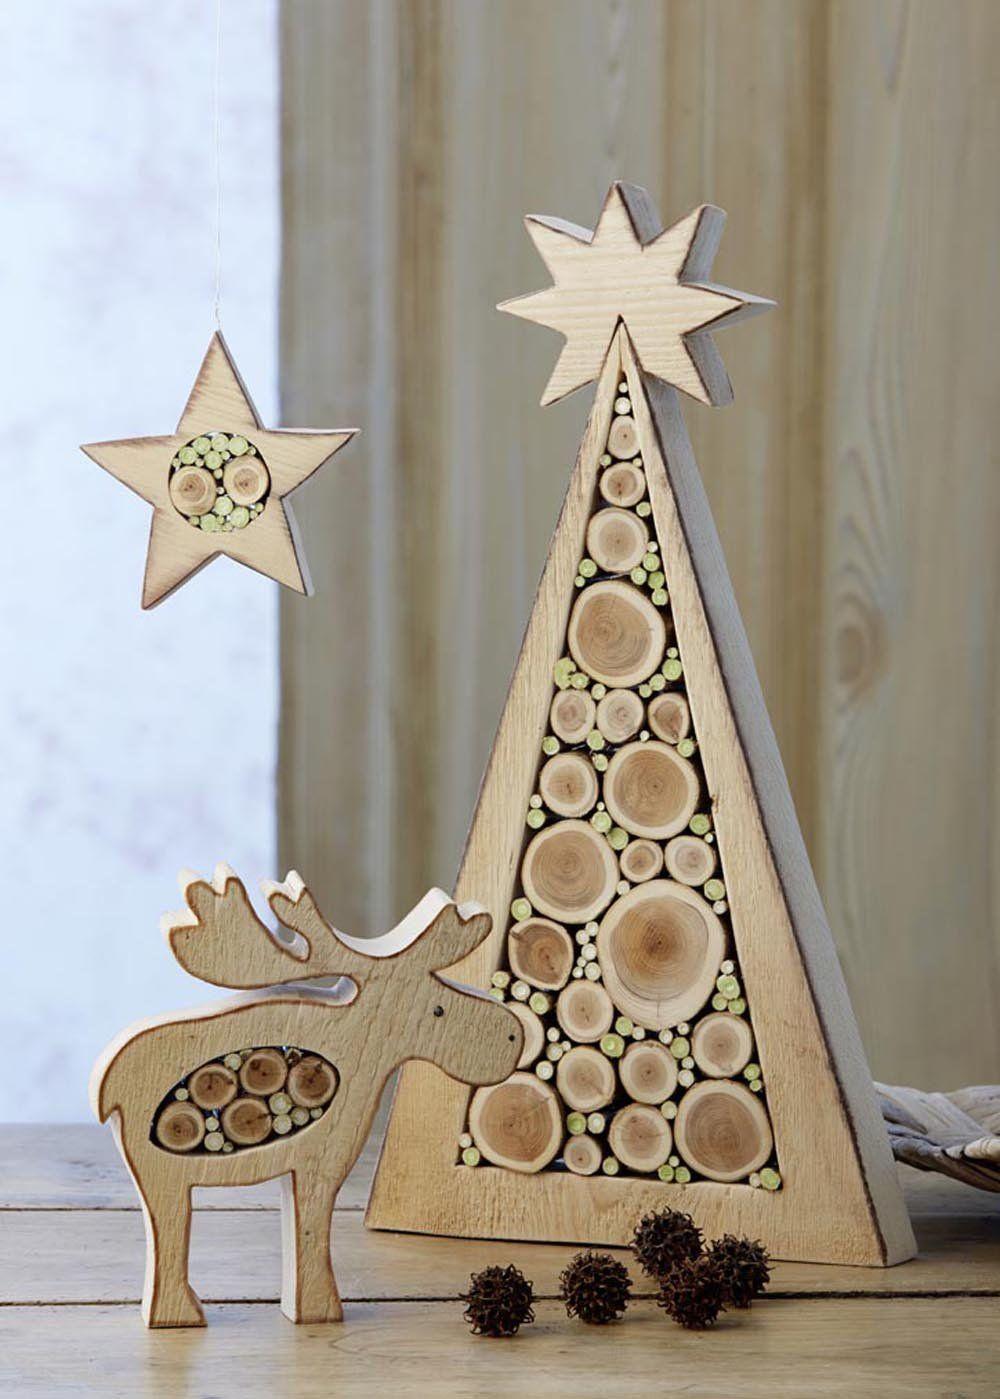 Deco Noel En Bois Naturel weihnachtsdeko aus holz: amazon.de: ingrid moras: bücher